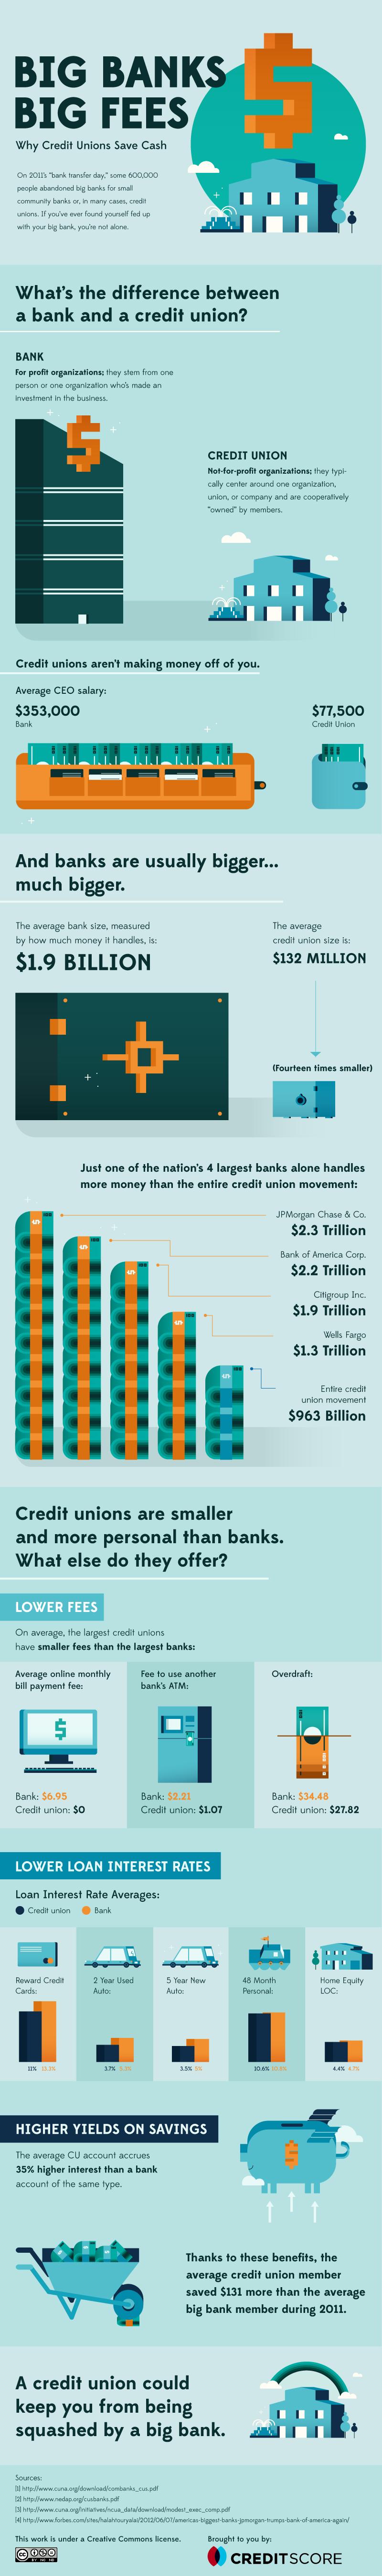 big-banks-big-fees_504f86452437b